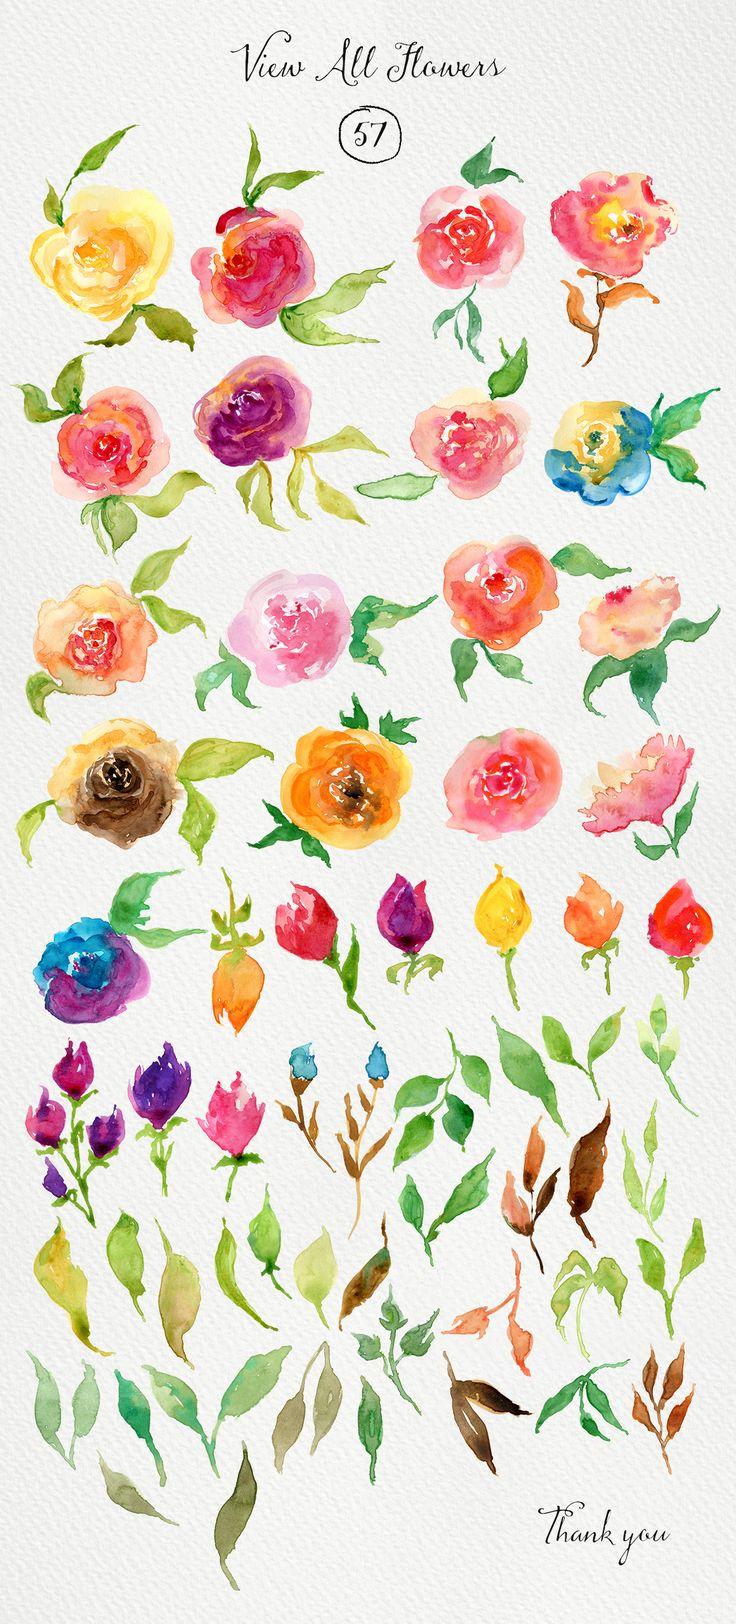 Watercolor Roses DIY by Webvilla on Creative Market